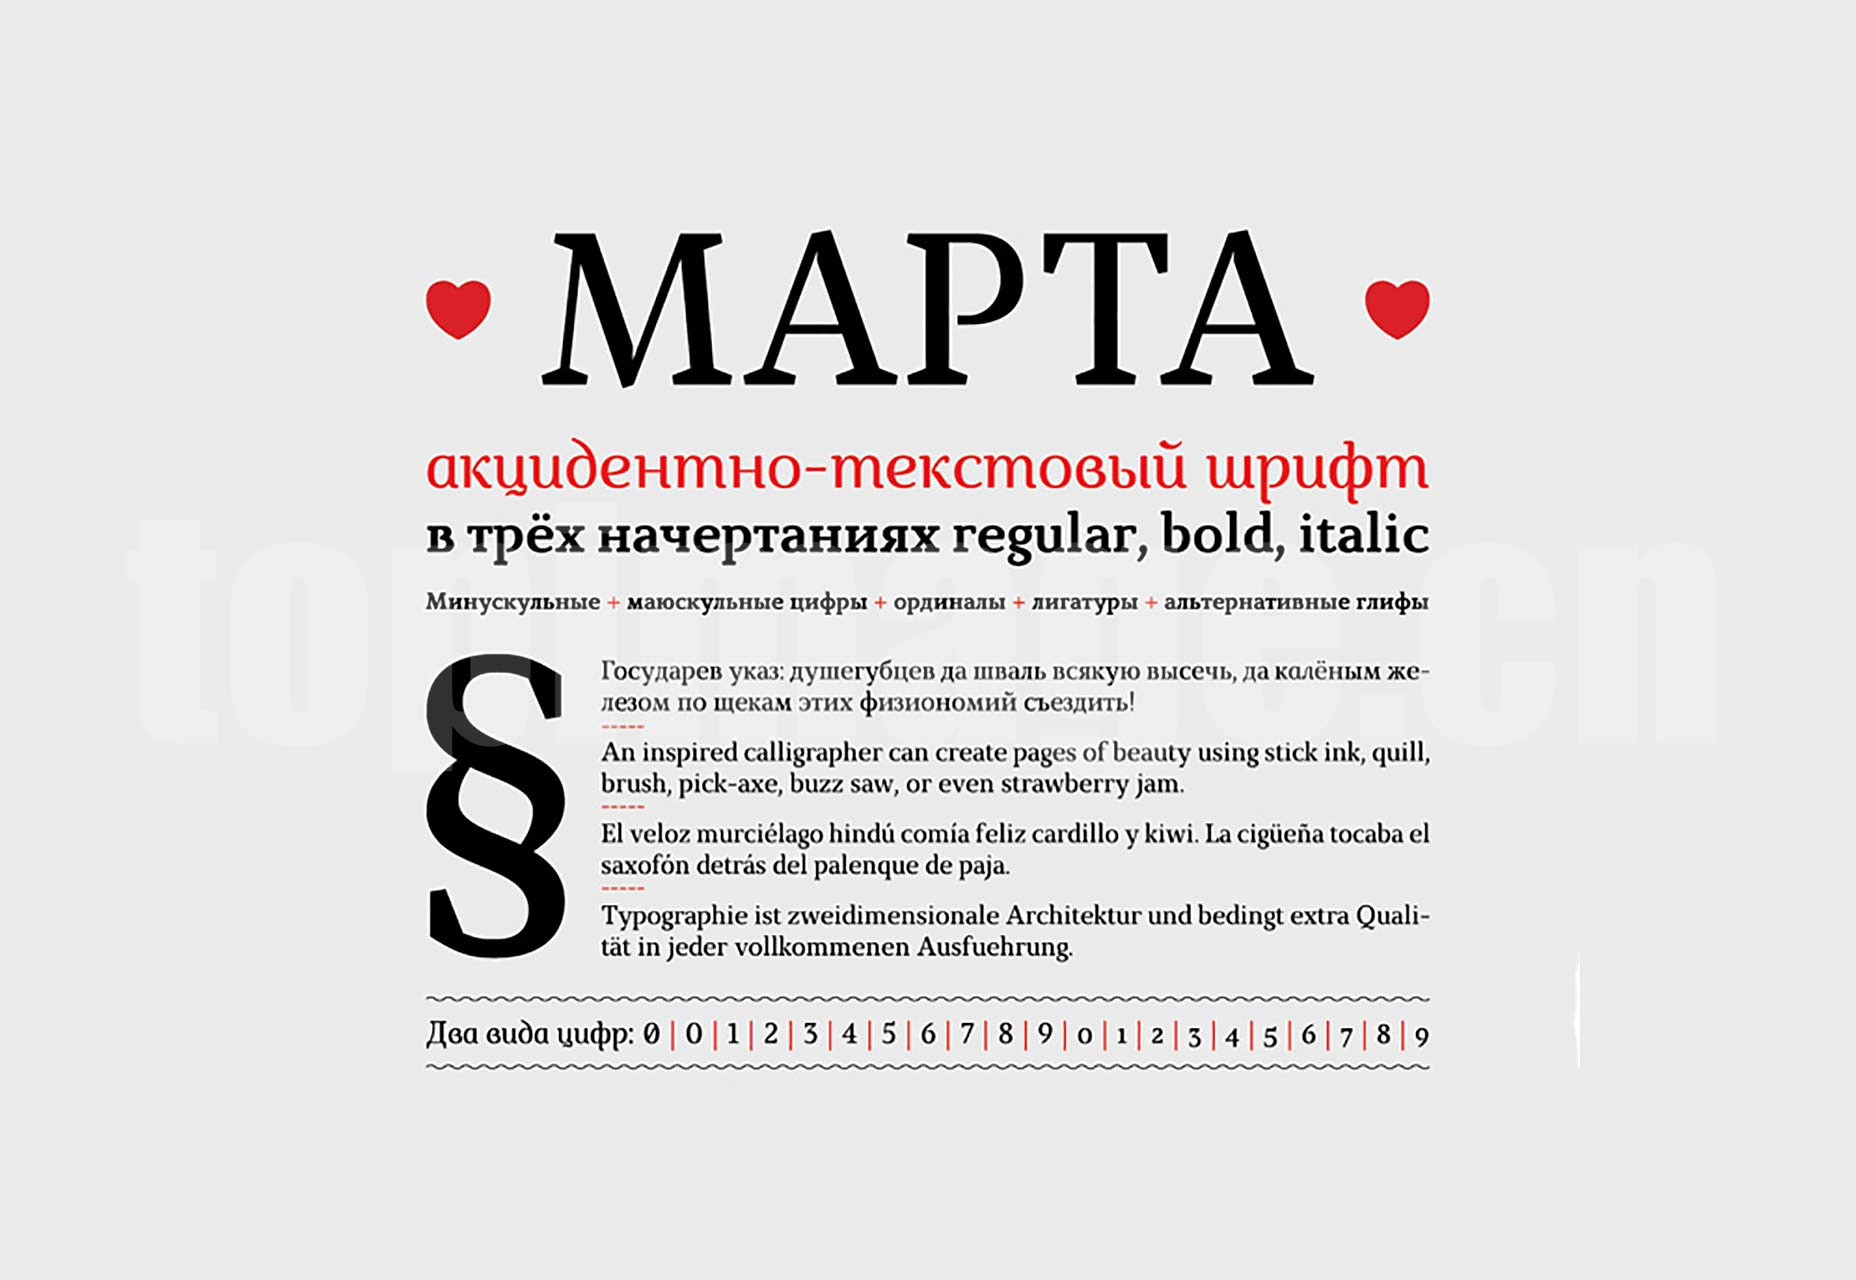 Marta创意优雅 现代简约 logo英文字体下载